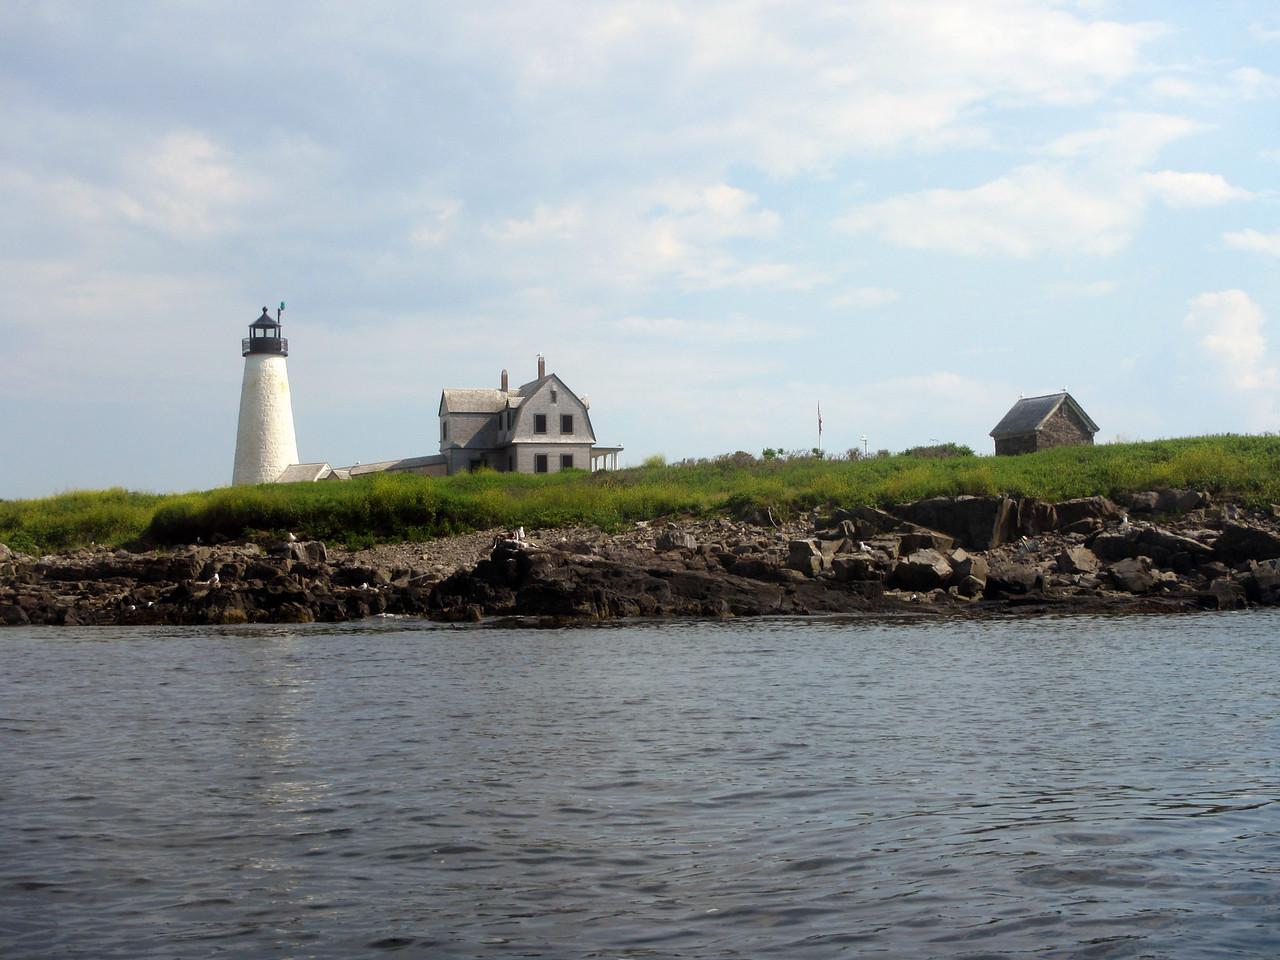 lighthouse fuelhouse 3162